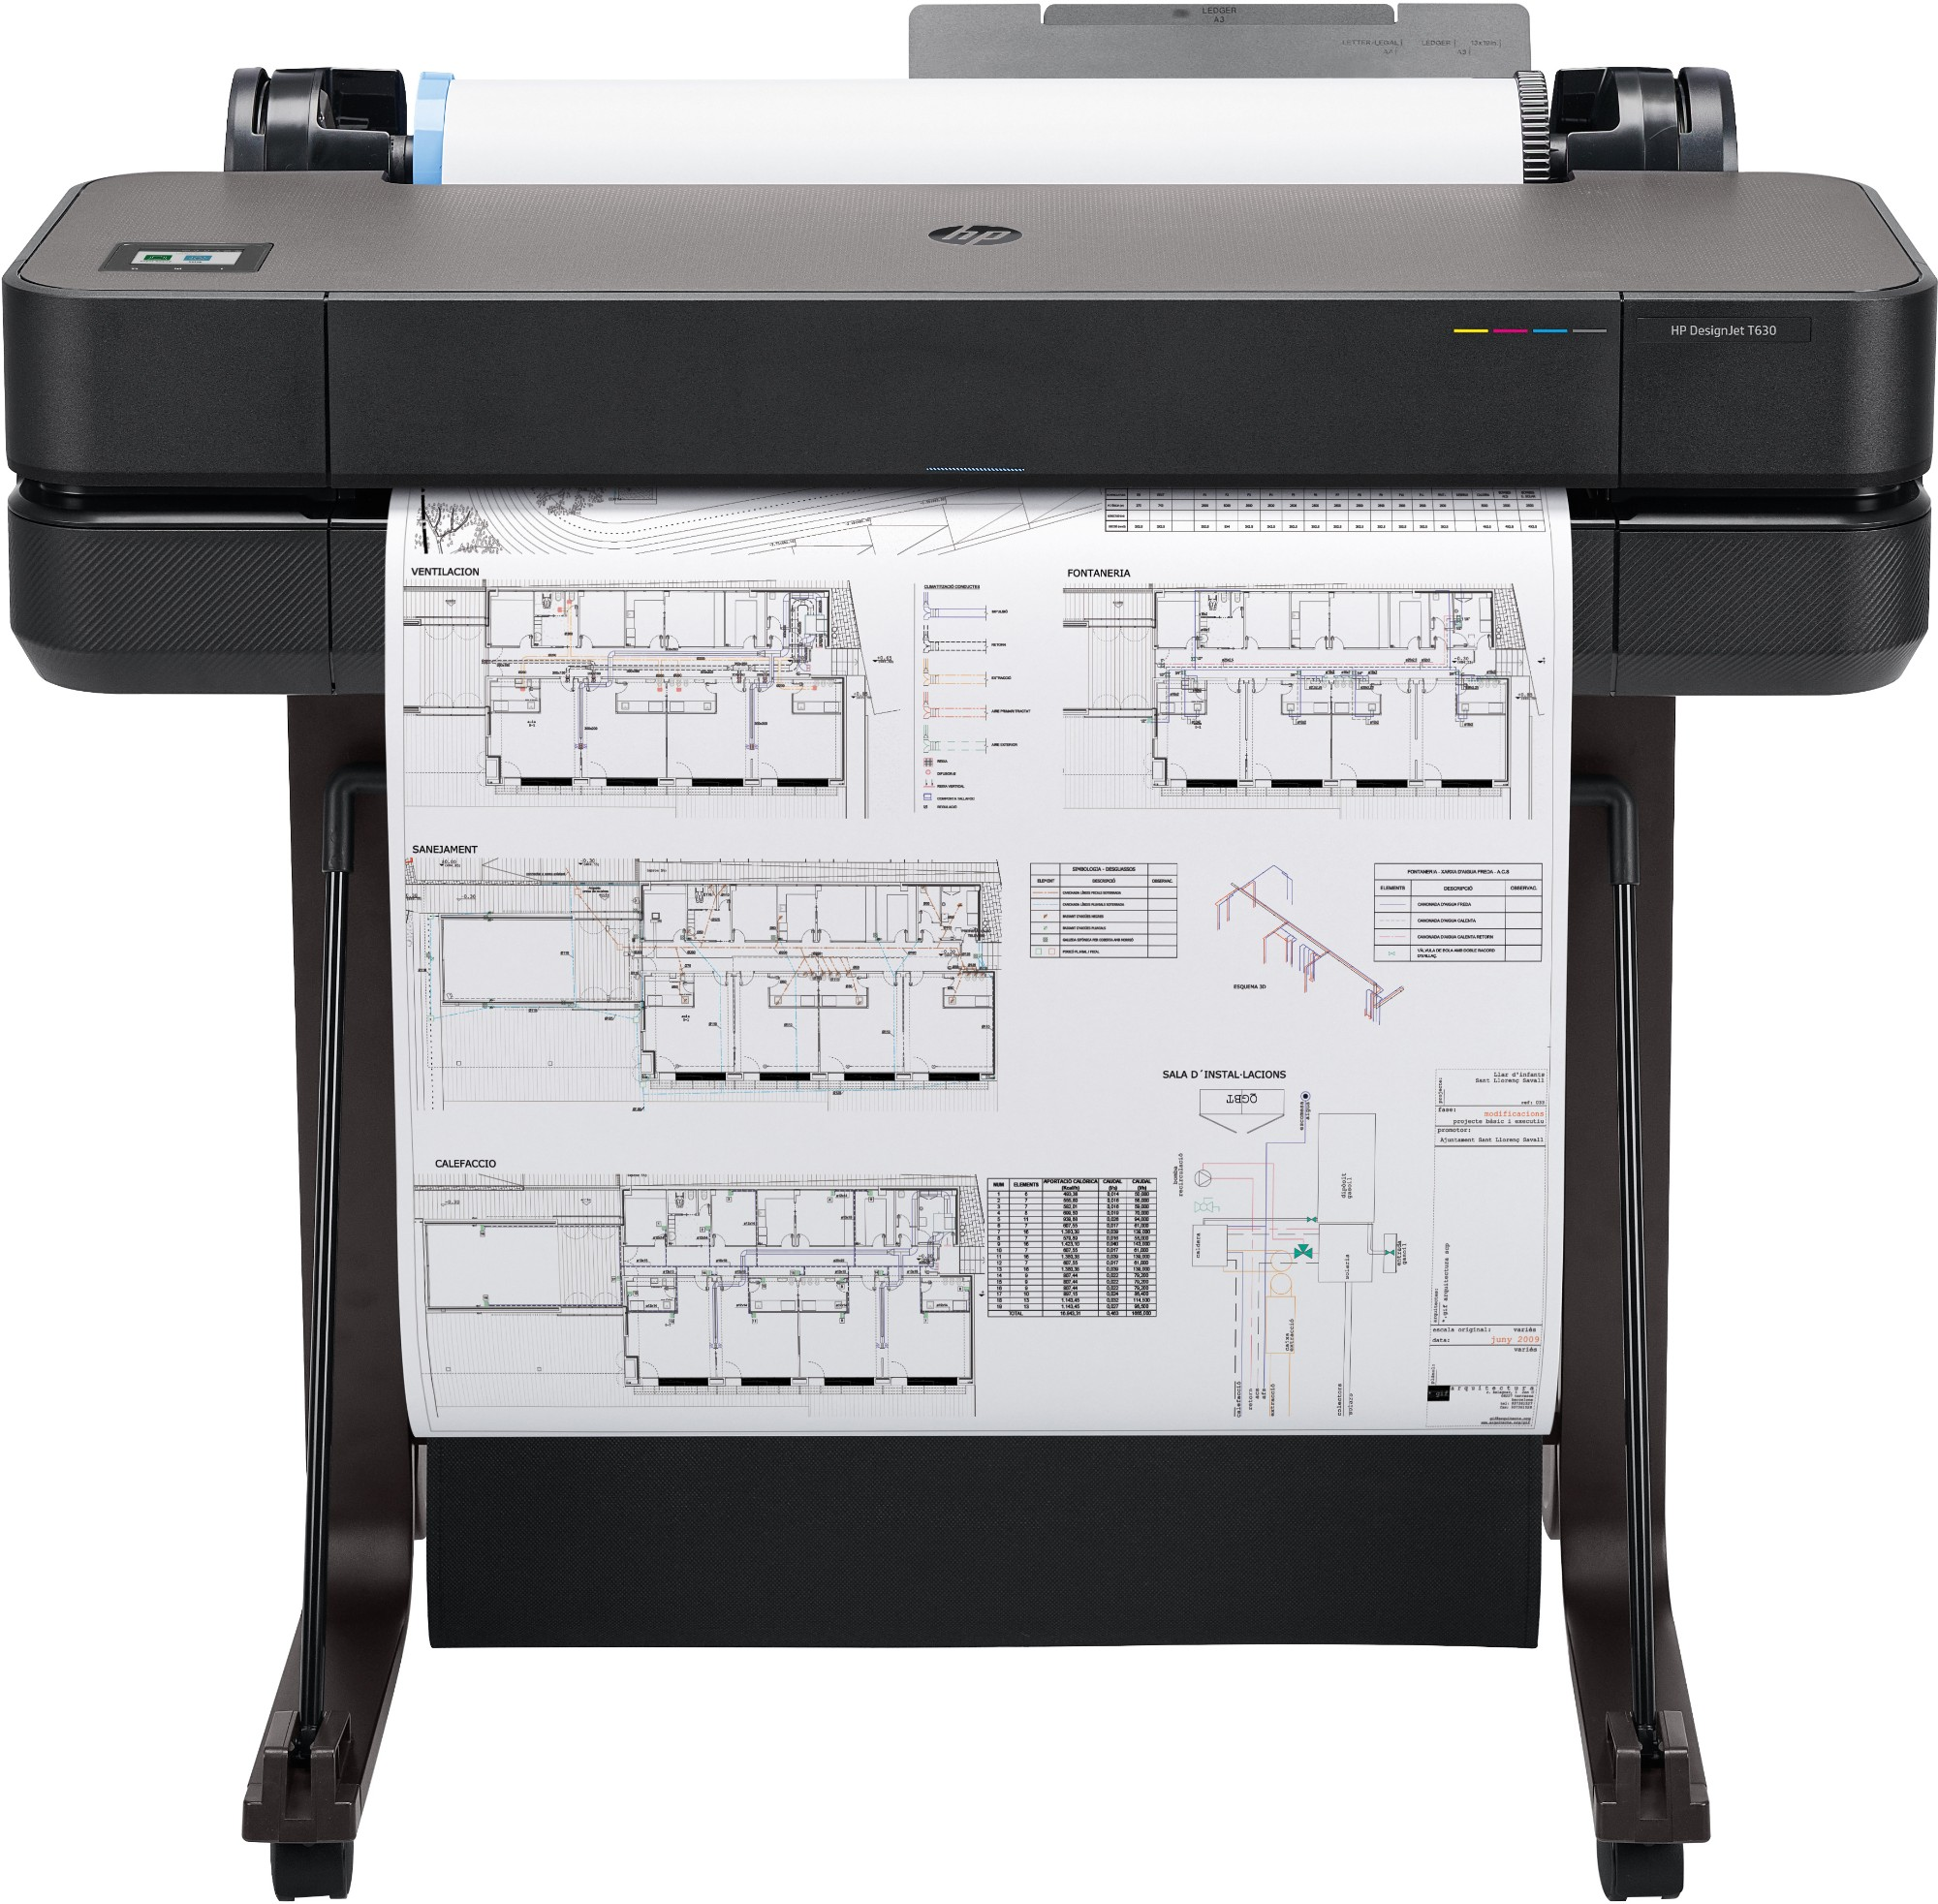 HP Designjet T630 large format printer Wi-Fi Thermal inkjet Colour 2400 x 1200 DPI 610 x 1897 mm Ethernet LAN